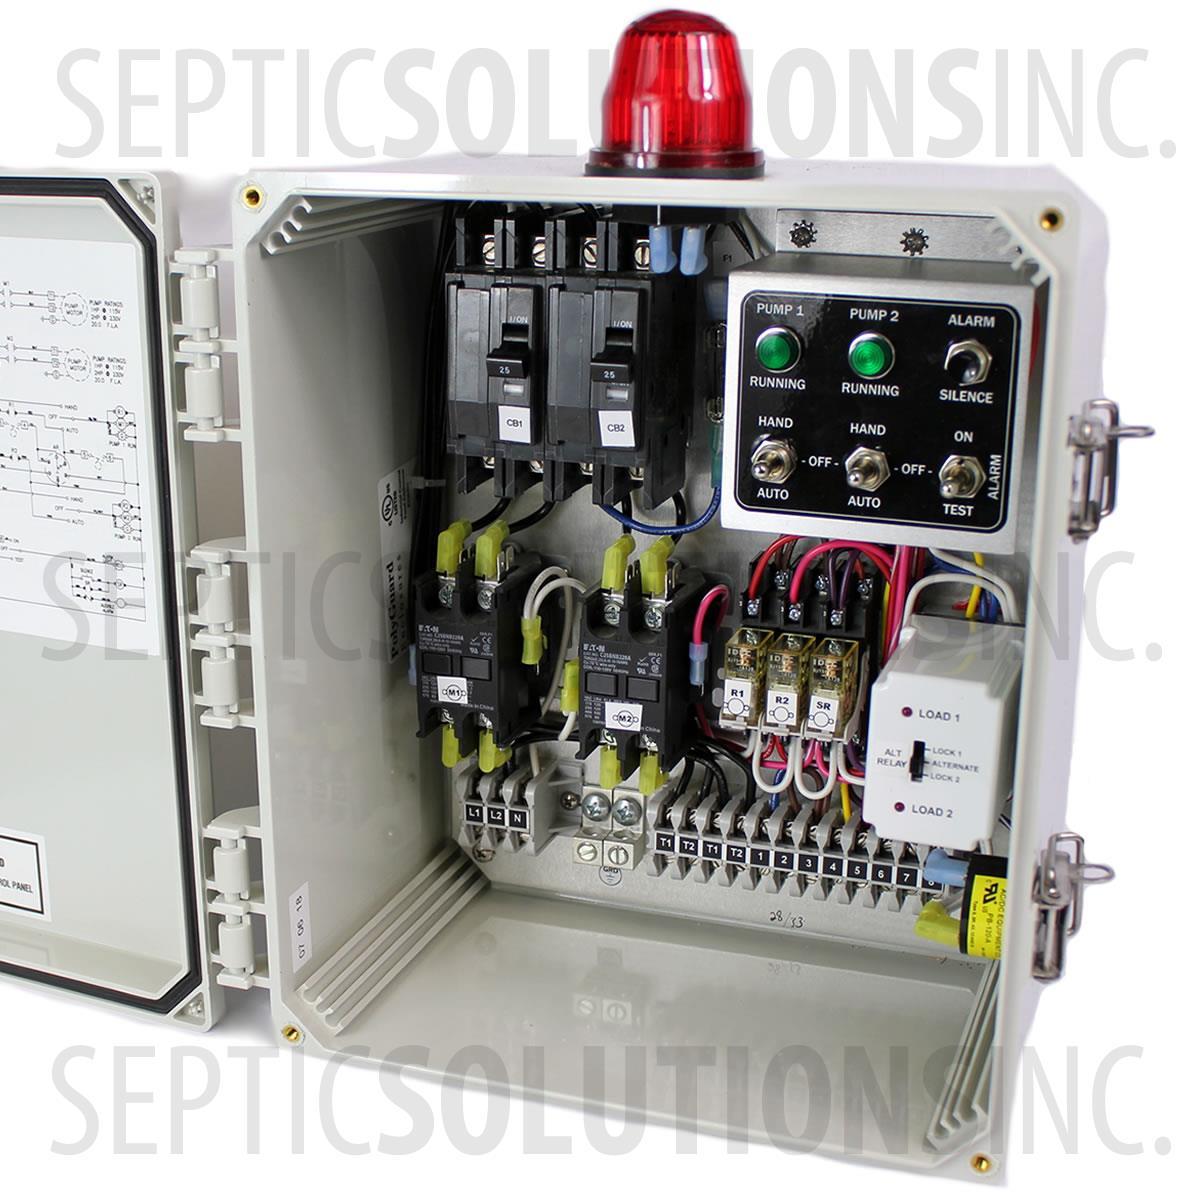 hight resolution of myers duplex pump control panel wiring diagram 1 wiring diagram duplex sewage pump control panels free